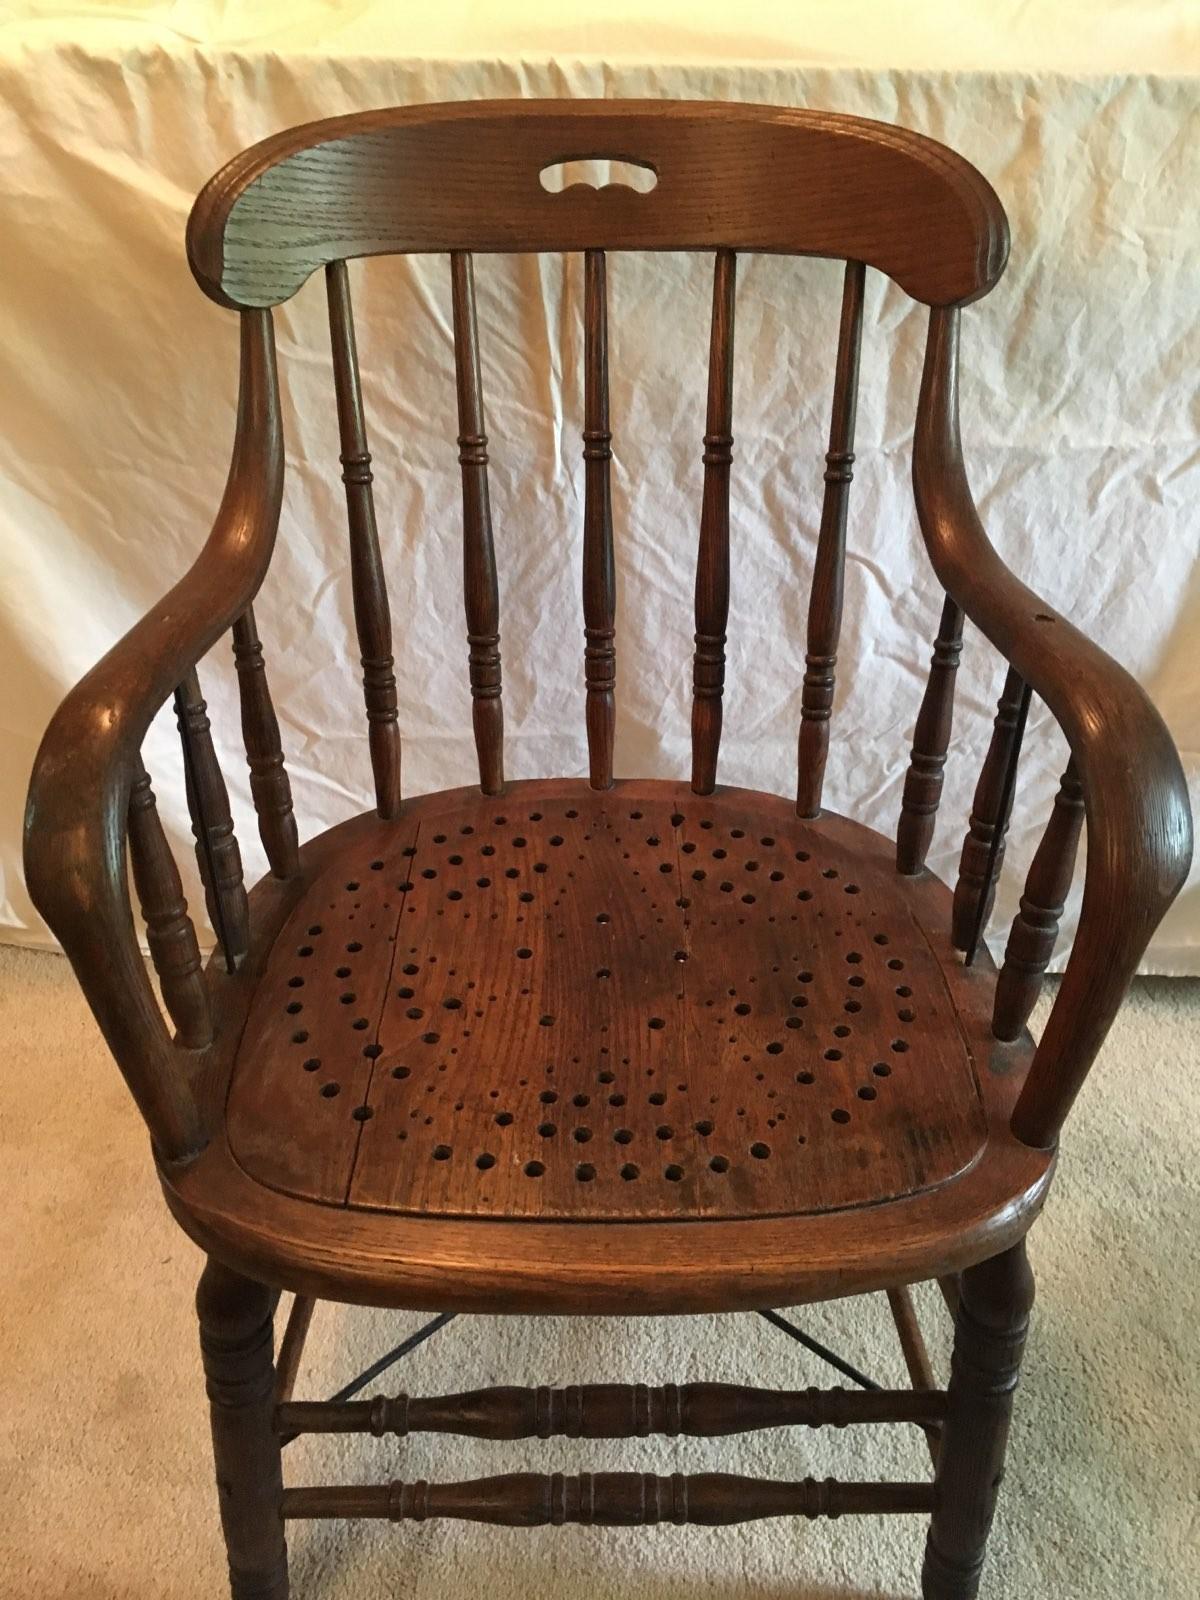 Identifying An Antique Chair Thriftyfun